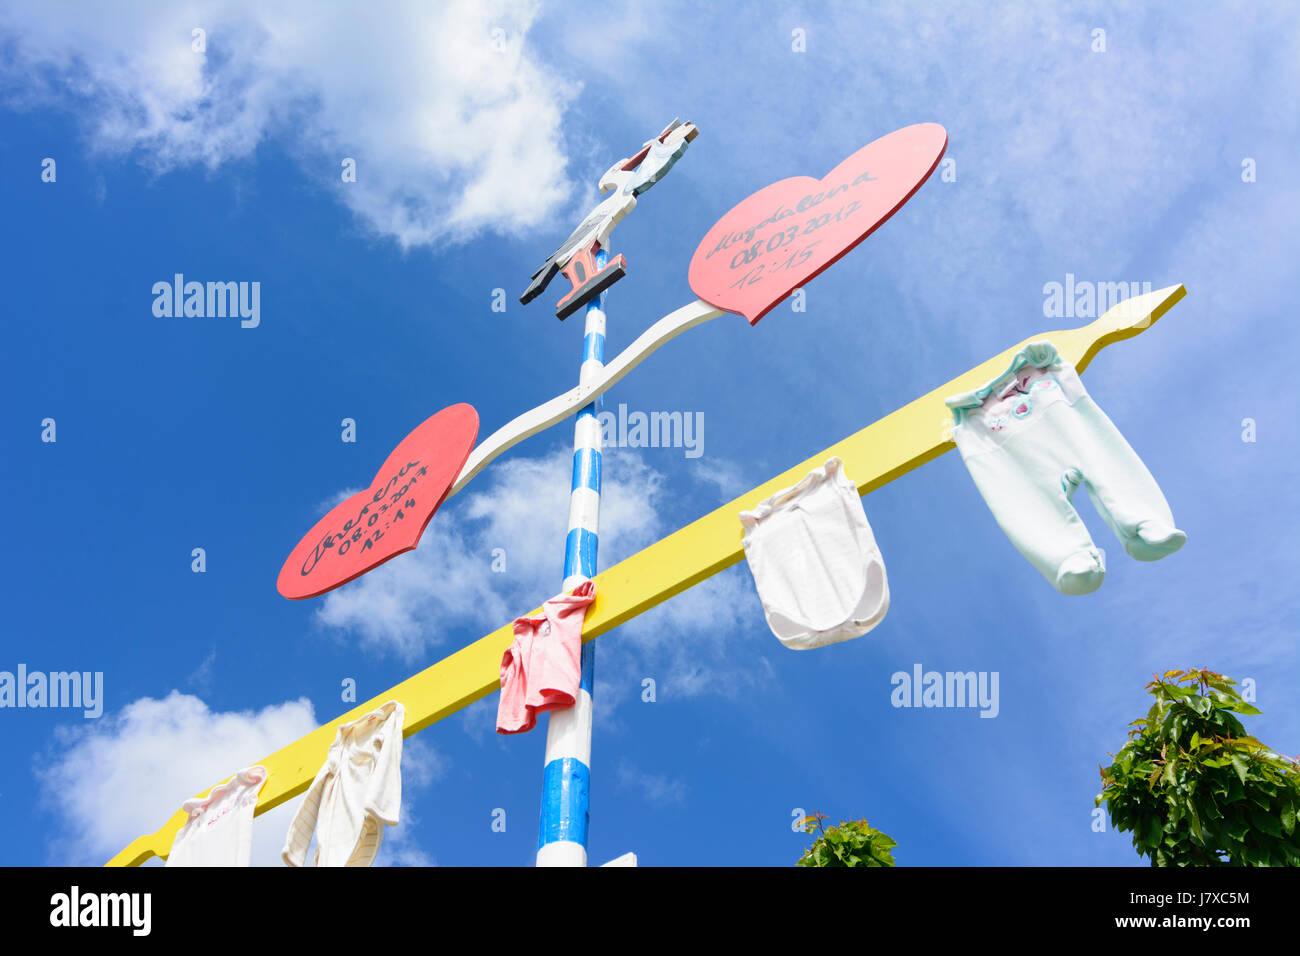 Kindsbaum (child pole) for twins twin kids, Geltendorf, Oberbayern, Upper Bavaria, Bayern, Bavaria, Germany - Stock Image